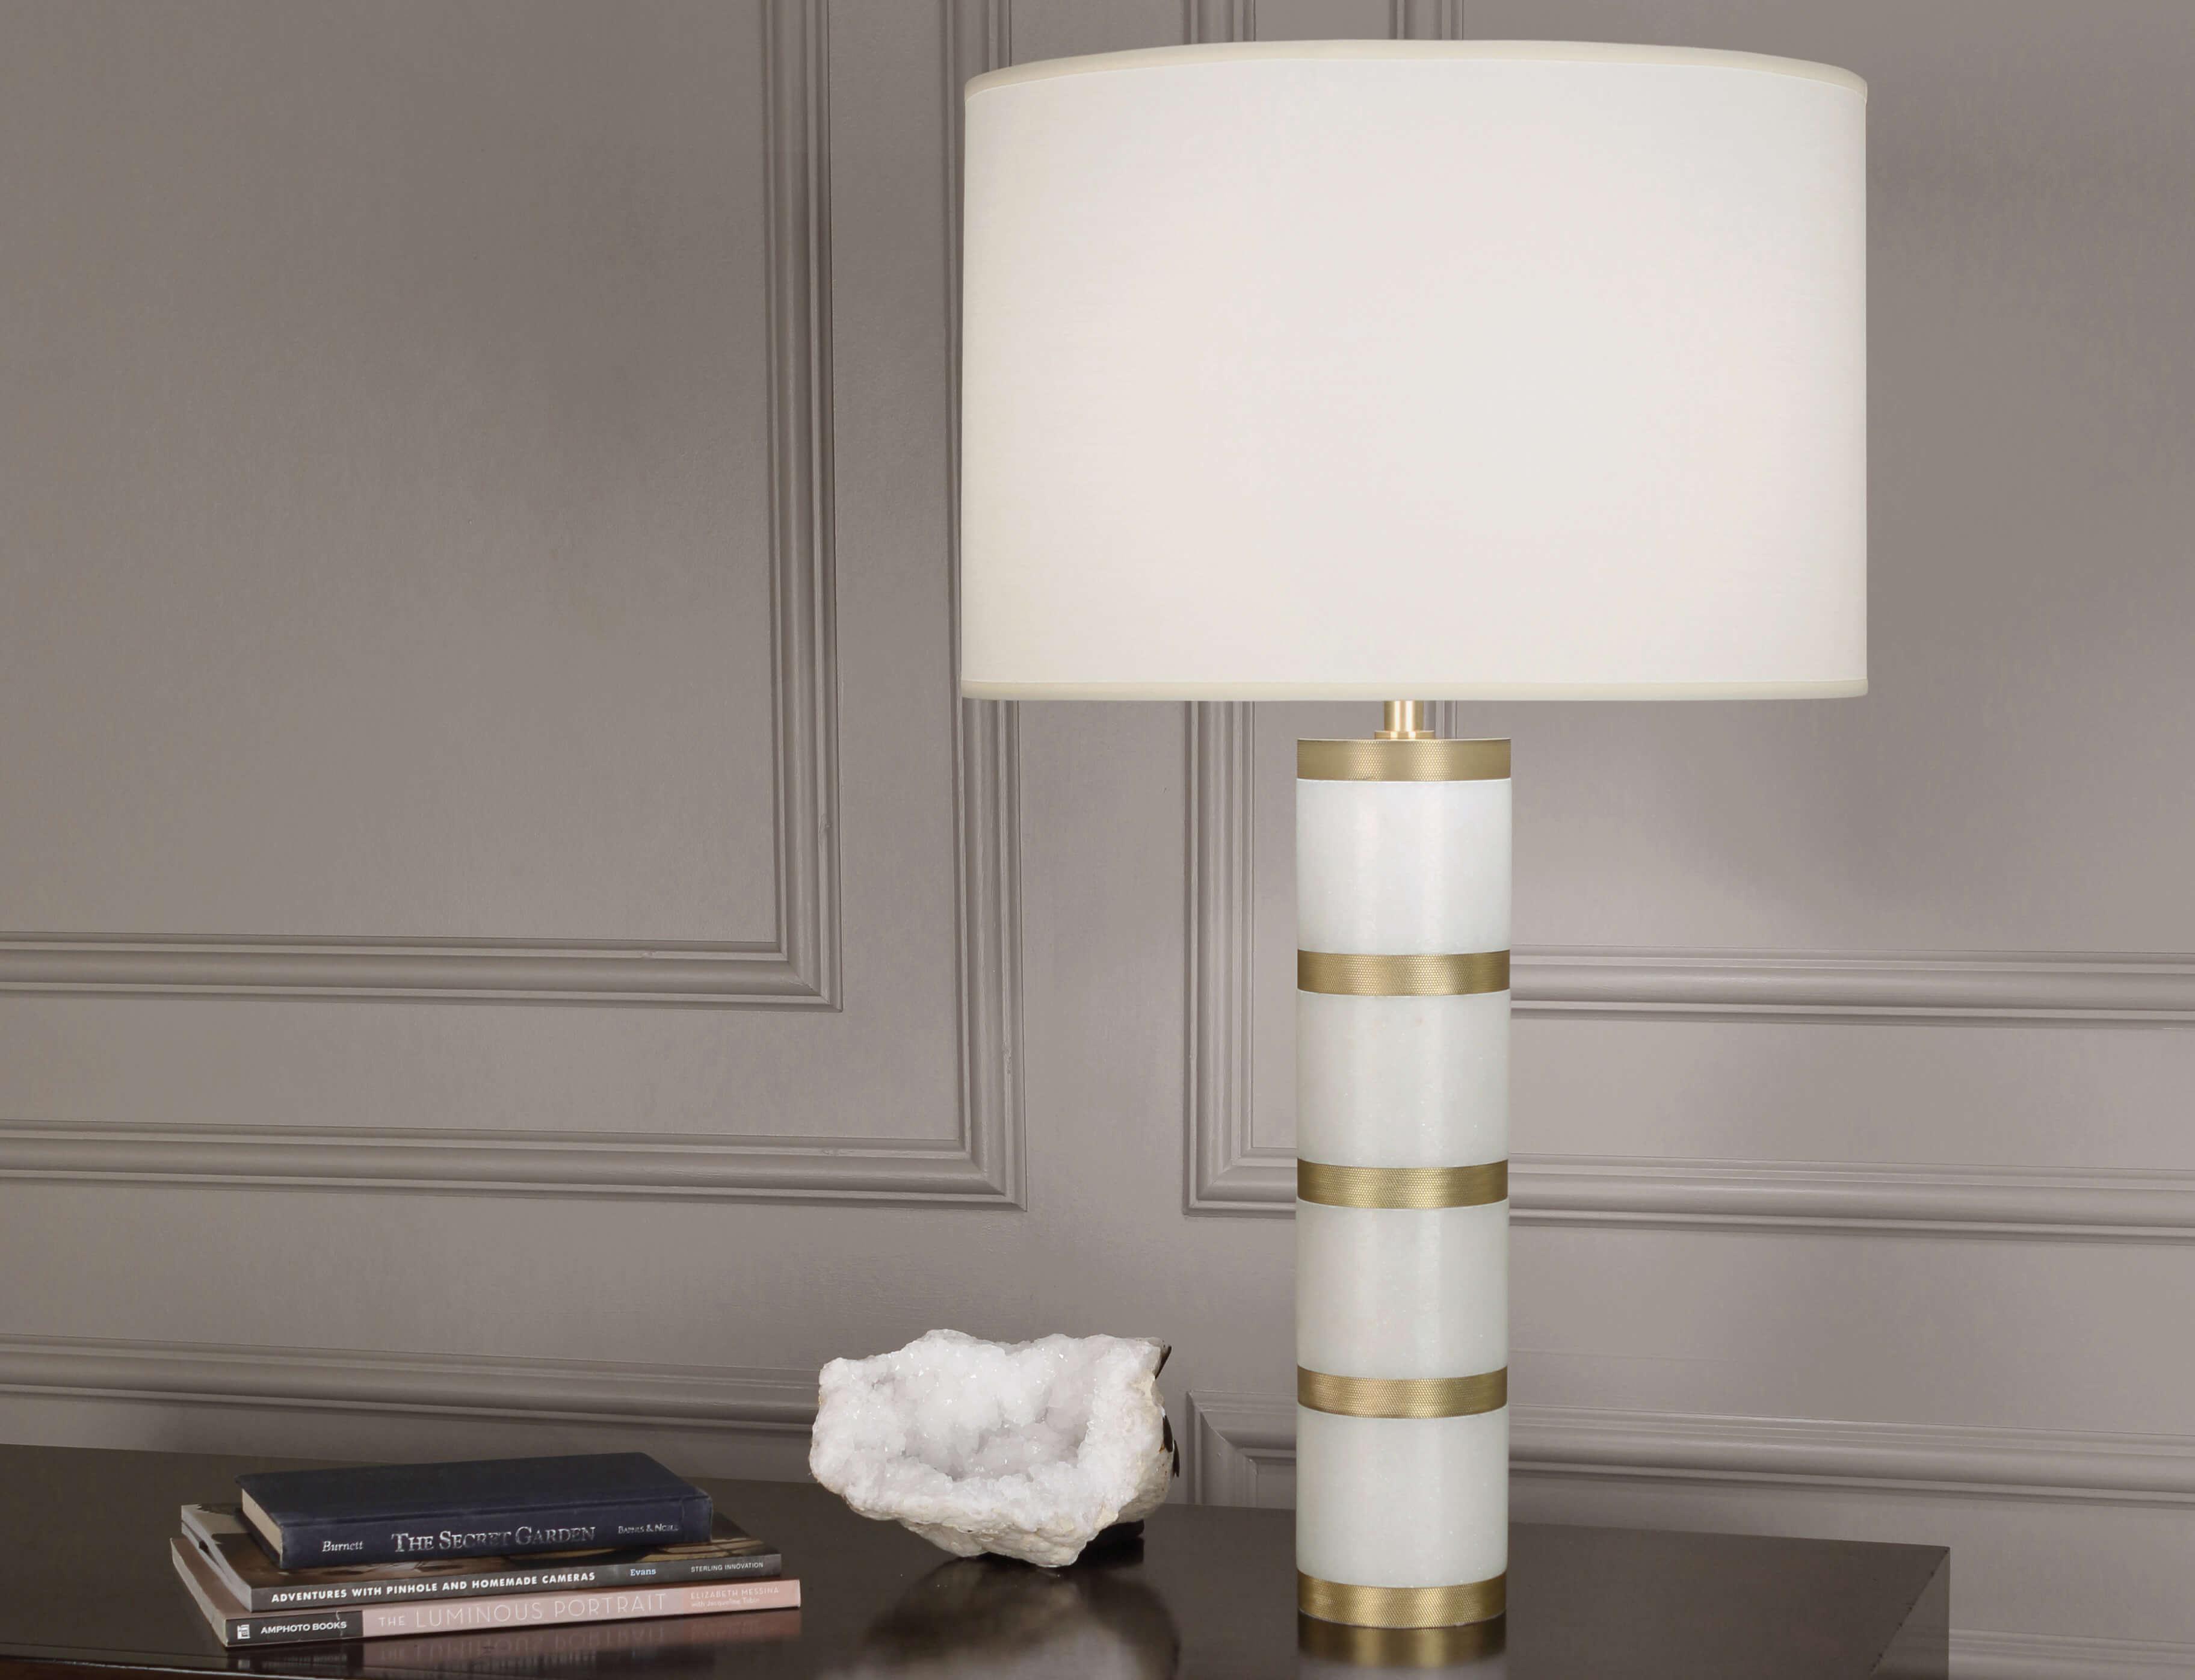 WYATT TABLE LAMP by Robert Abbey